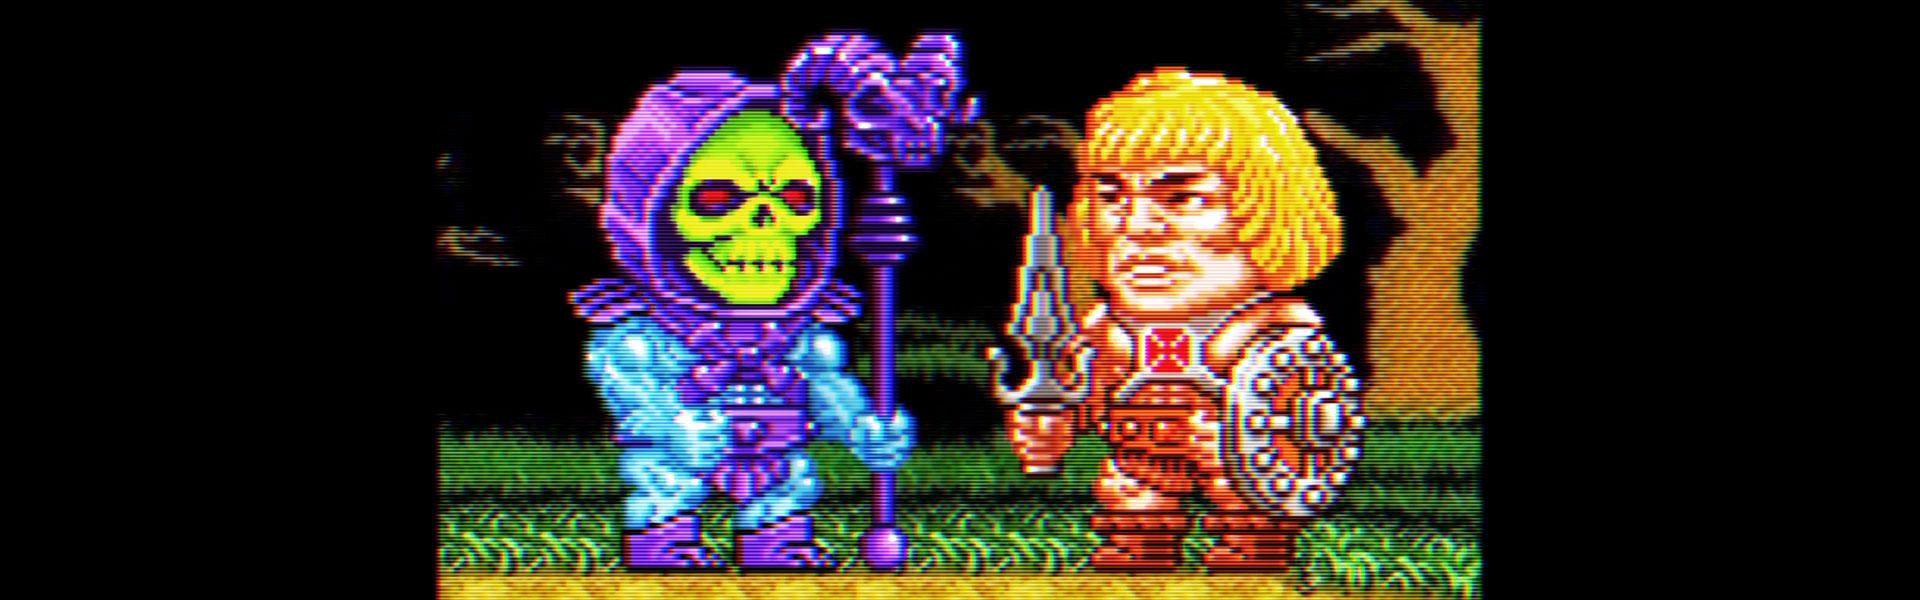 motu pixel art- he-man and skeletor pixels